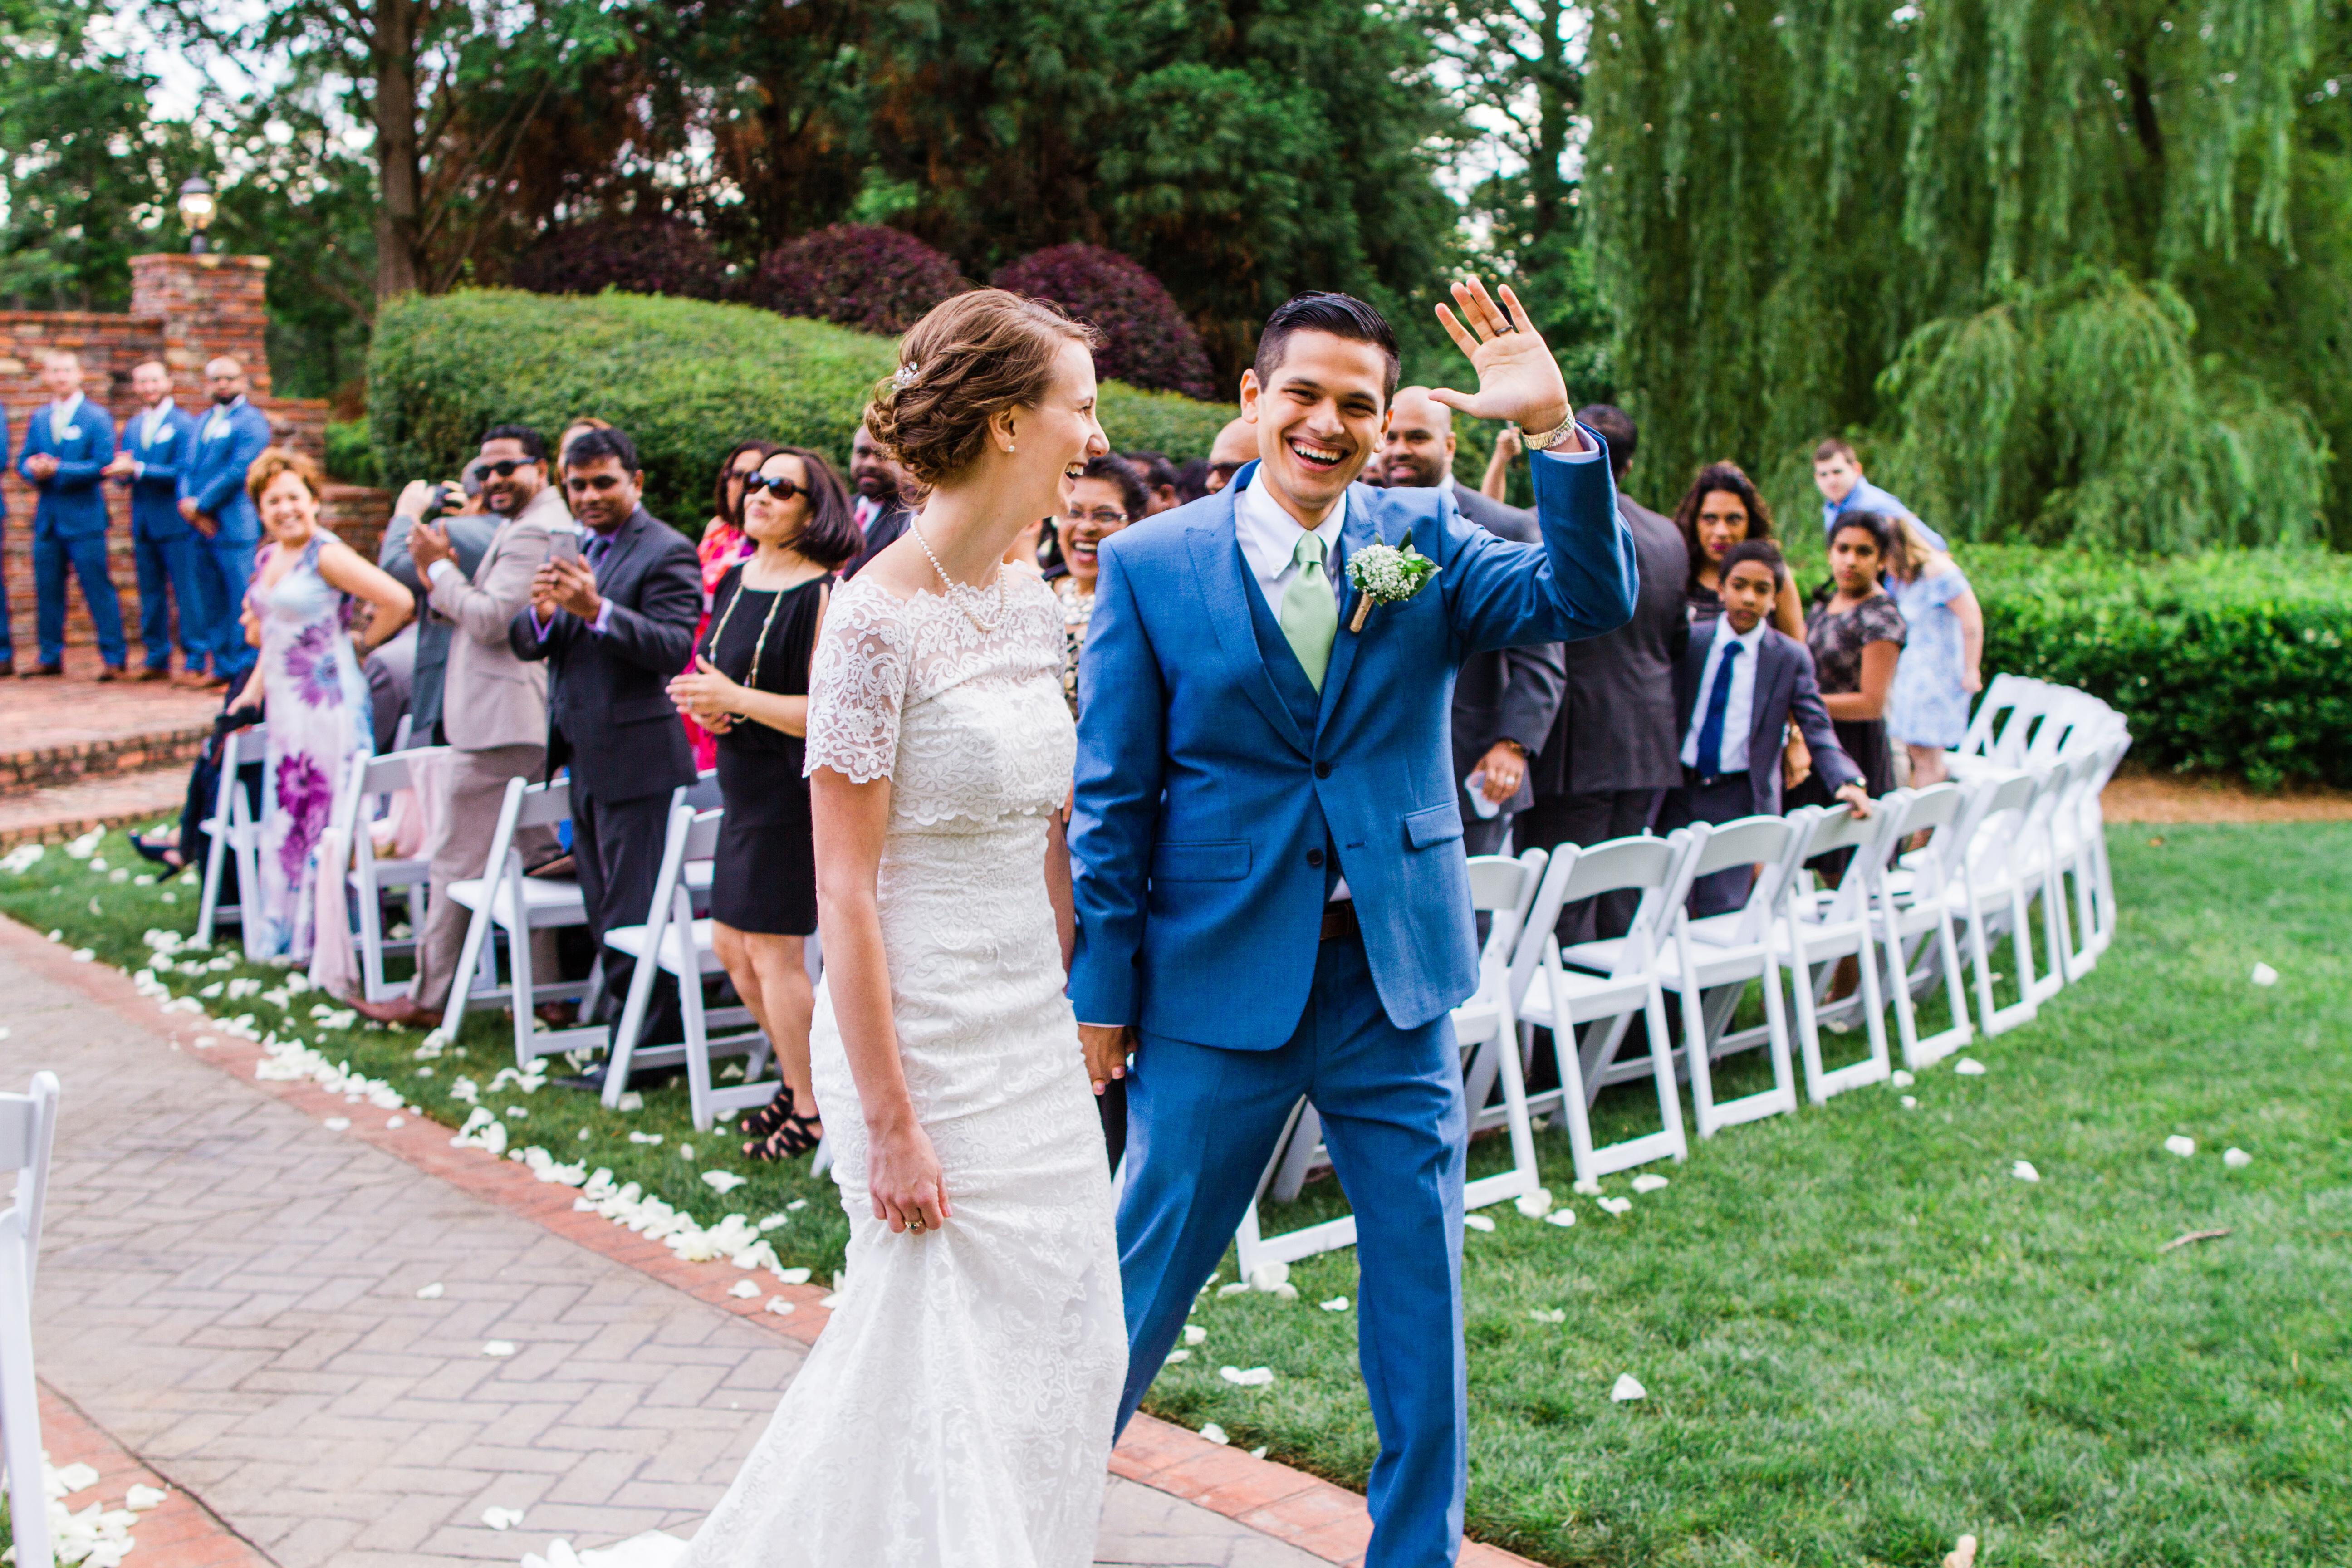 Asterisk Photo_Glaccum Wedding Preview-14